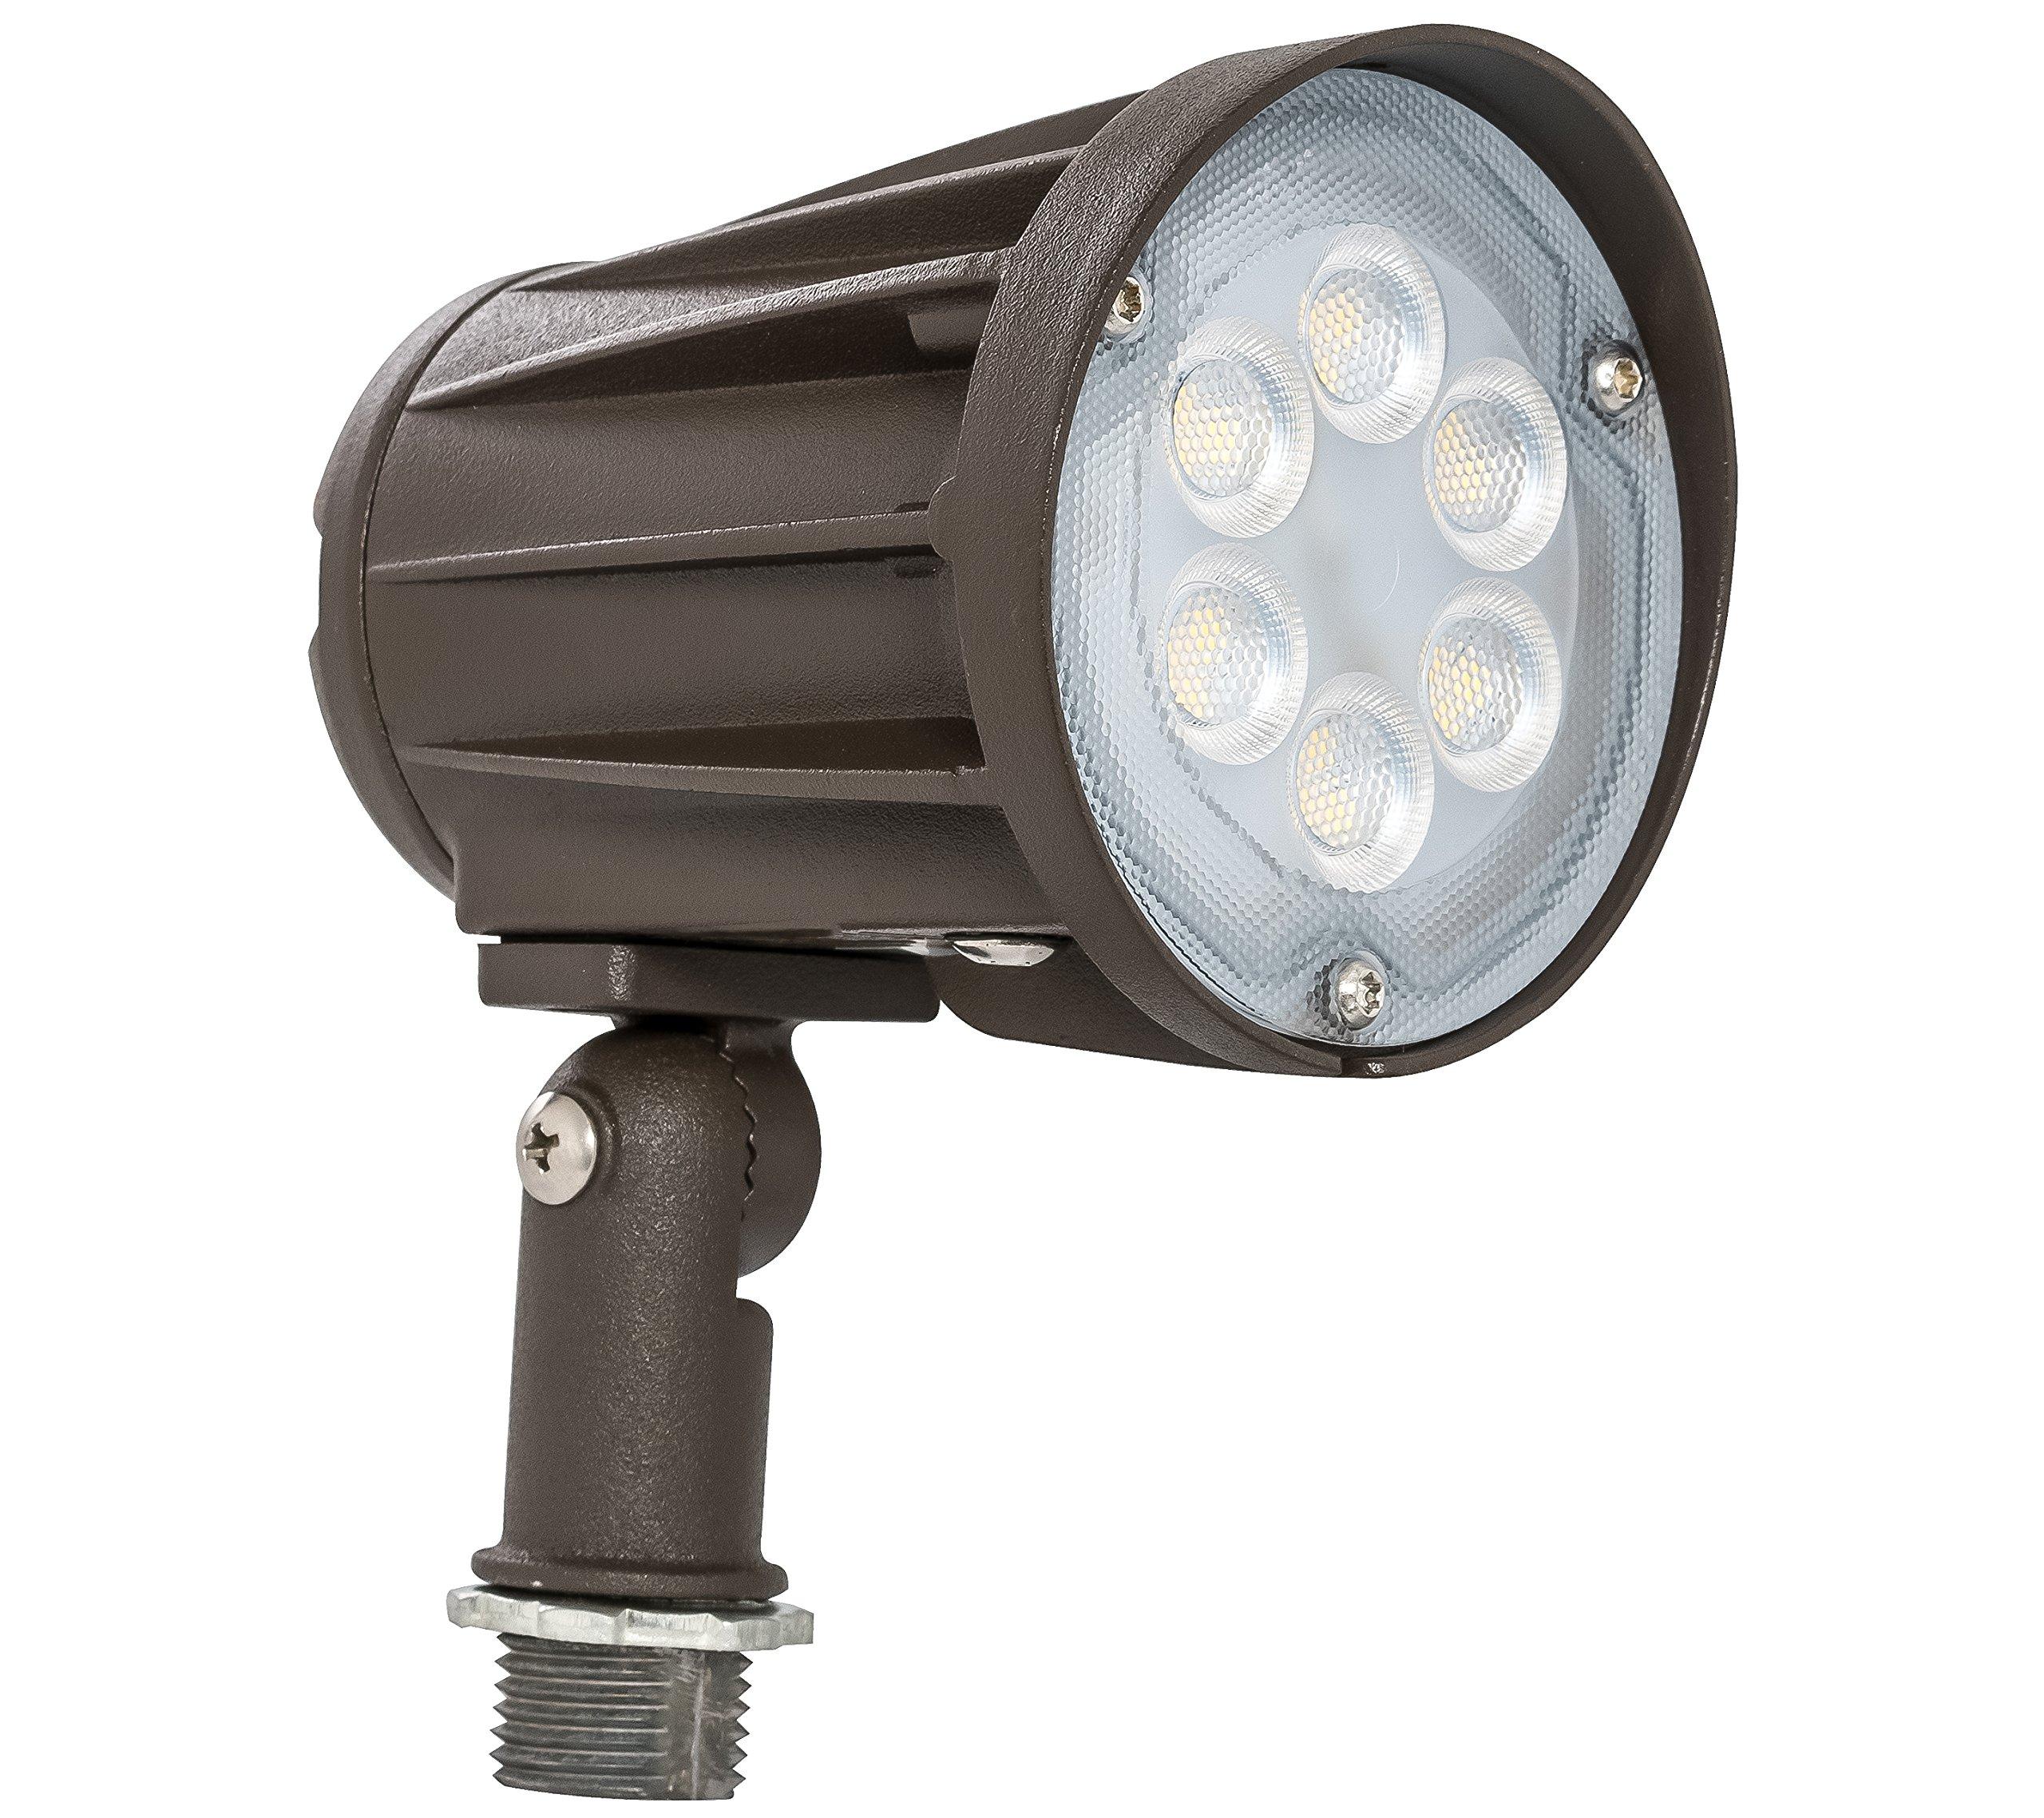 Westgate Lighting LED Outdoor Landscape Garden Bullet Flood Lights - Path Walkway Lawn Spotlights - Knuckle Mount - IP65 Waterproof - High Lumen - UL/DLC Listed - 120-277V (15W, 3000K Knuckle)